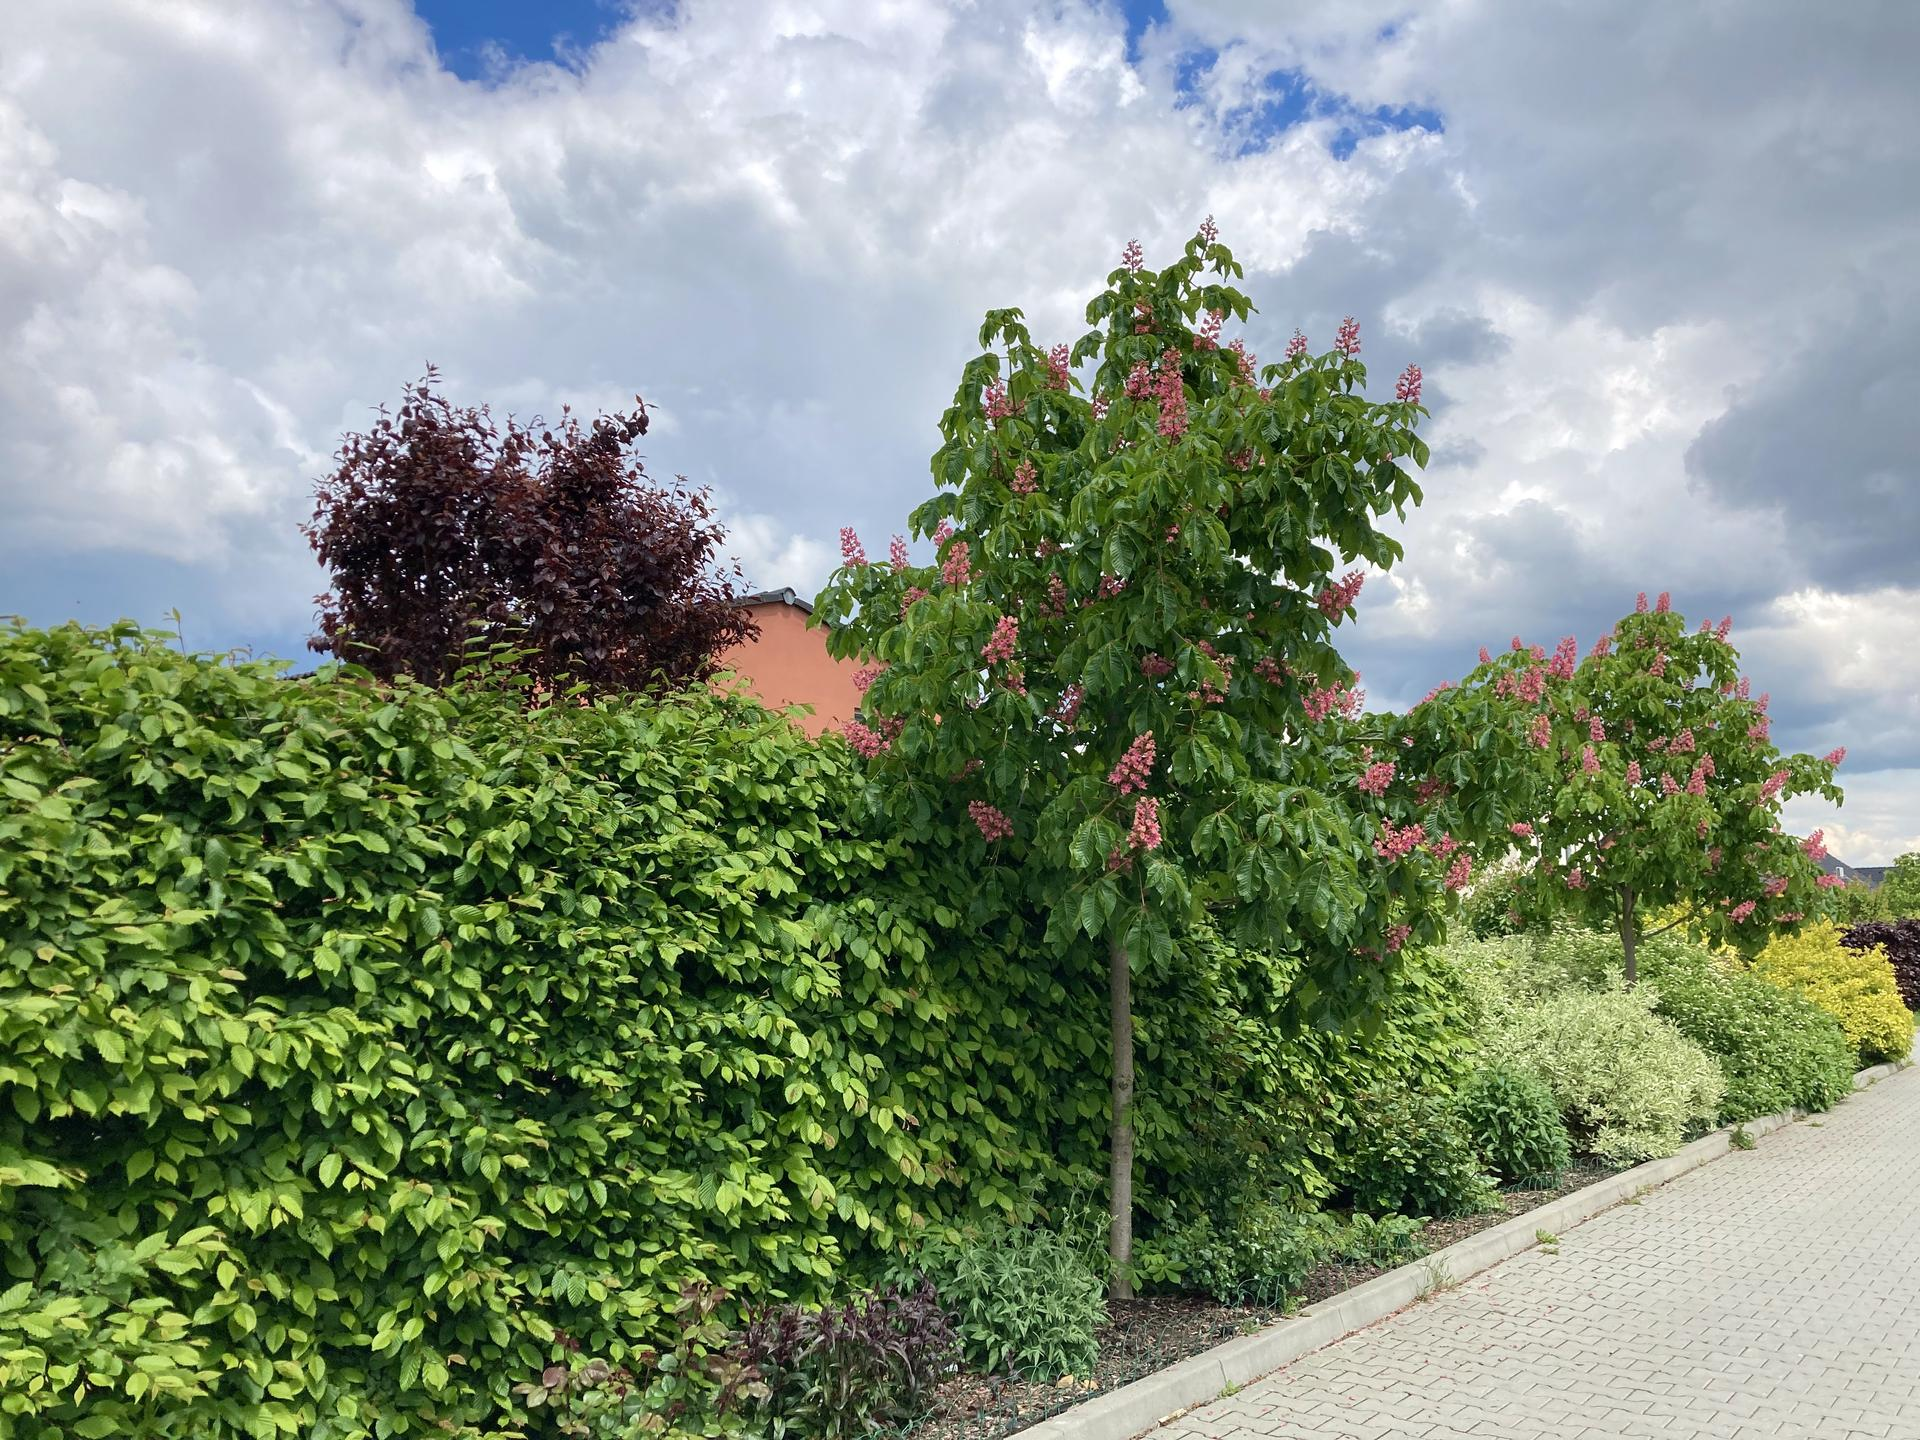 Zahrada 2021 - Zahrada zvenku... Kastanova ulice... na satelit to neni nejhorsi- uz k nam neni skoro videt😃!